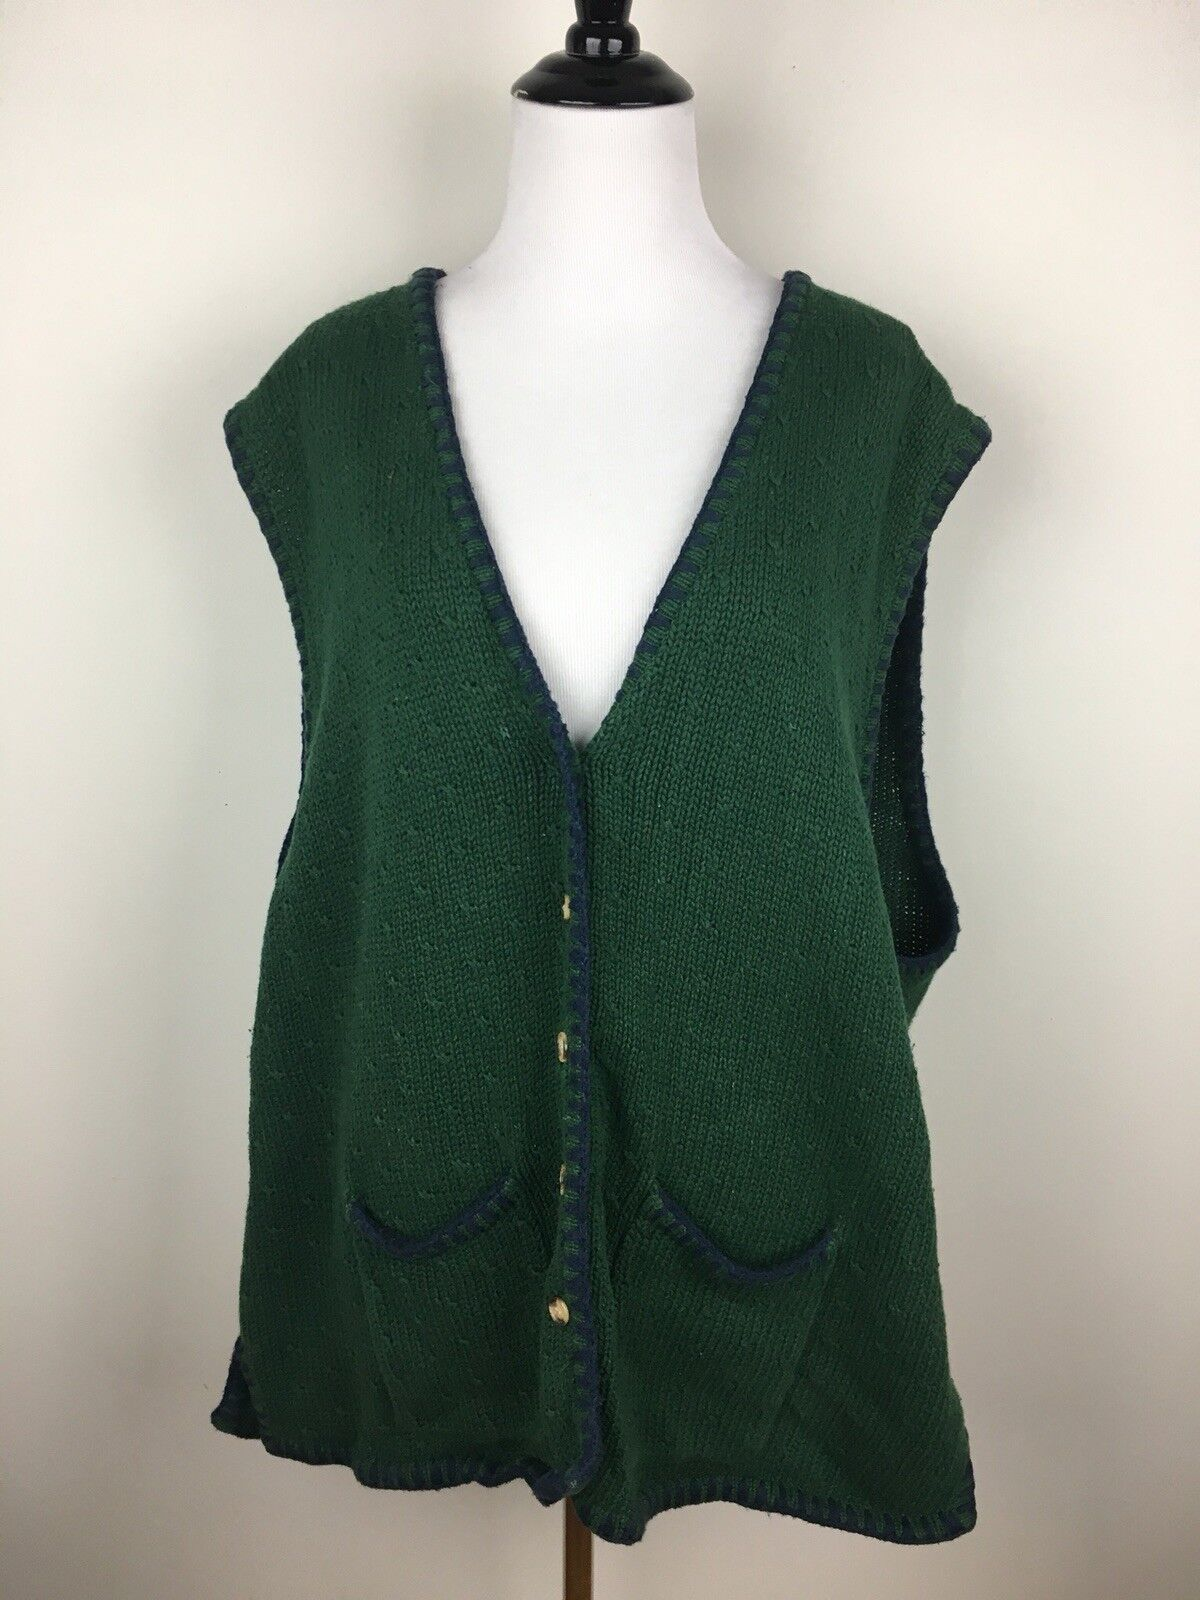 Baxter & Wells Womens Sweater Vest Hunter Green Sz 3X Cotton Blanket Stitch